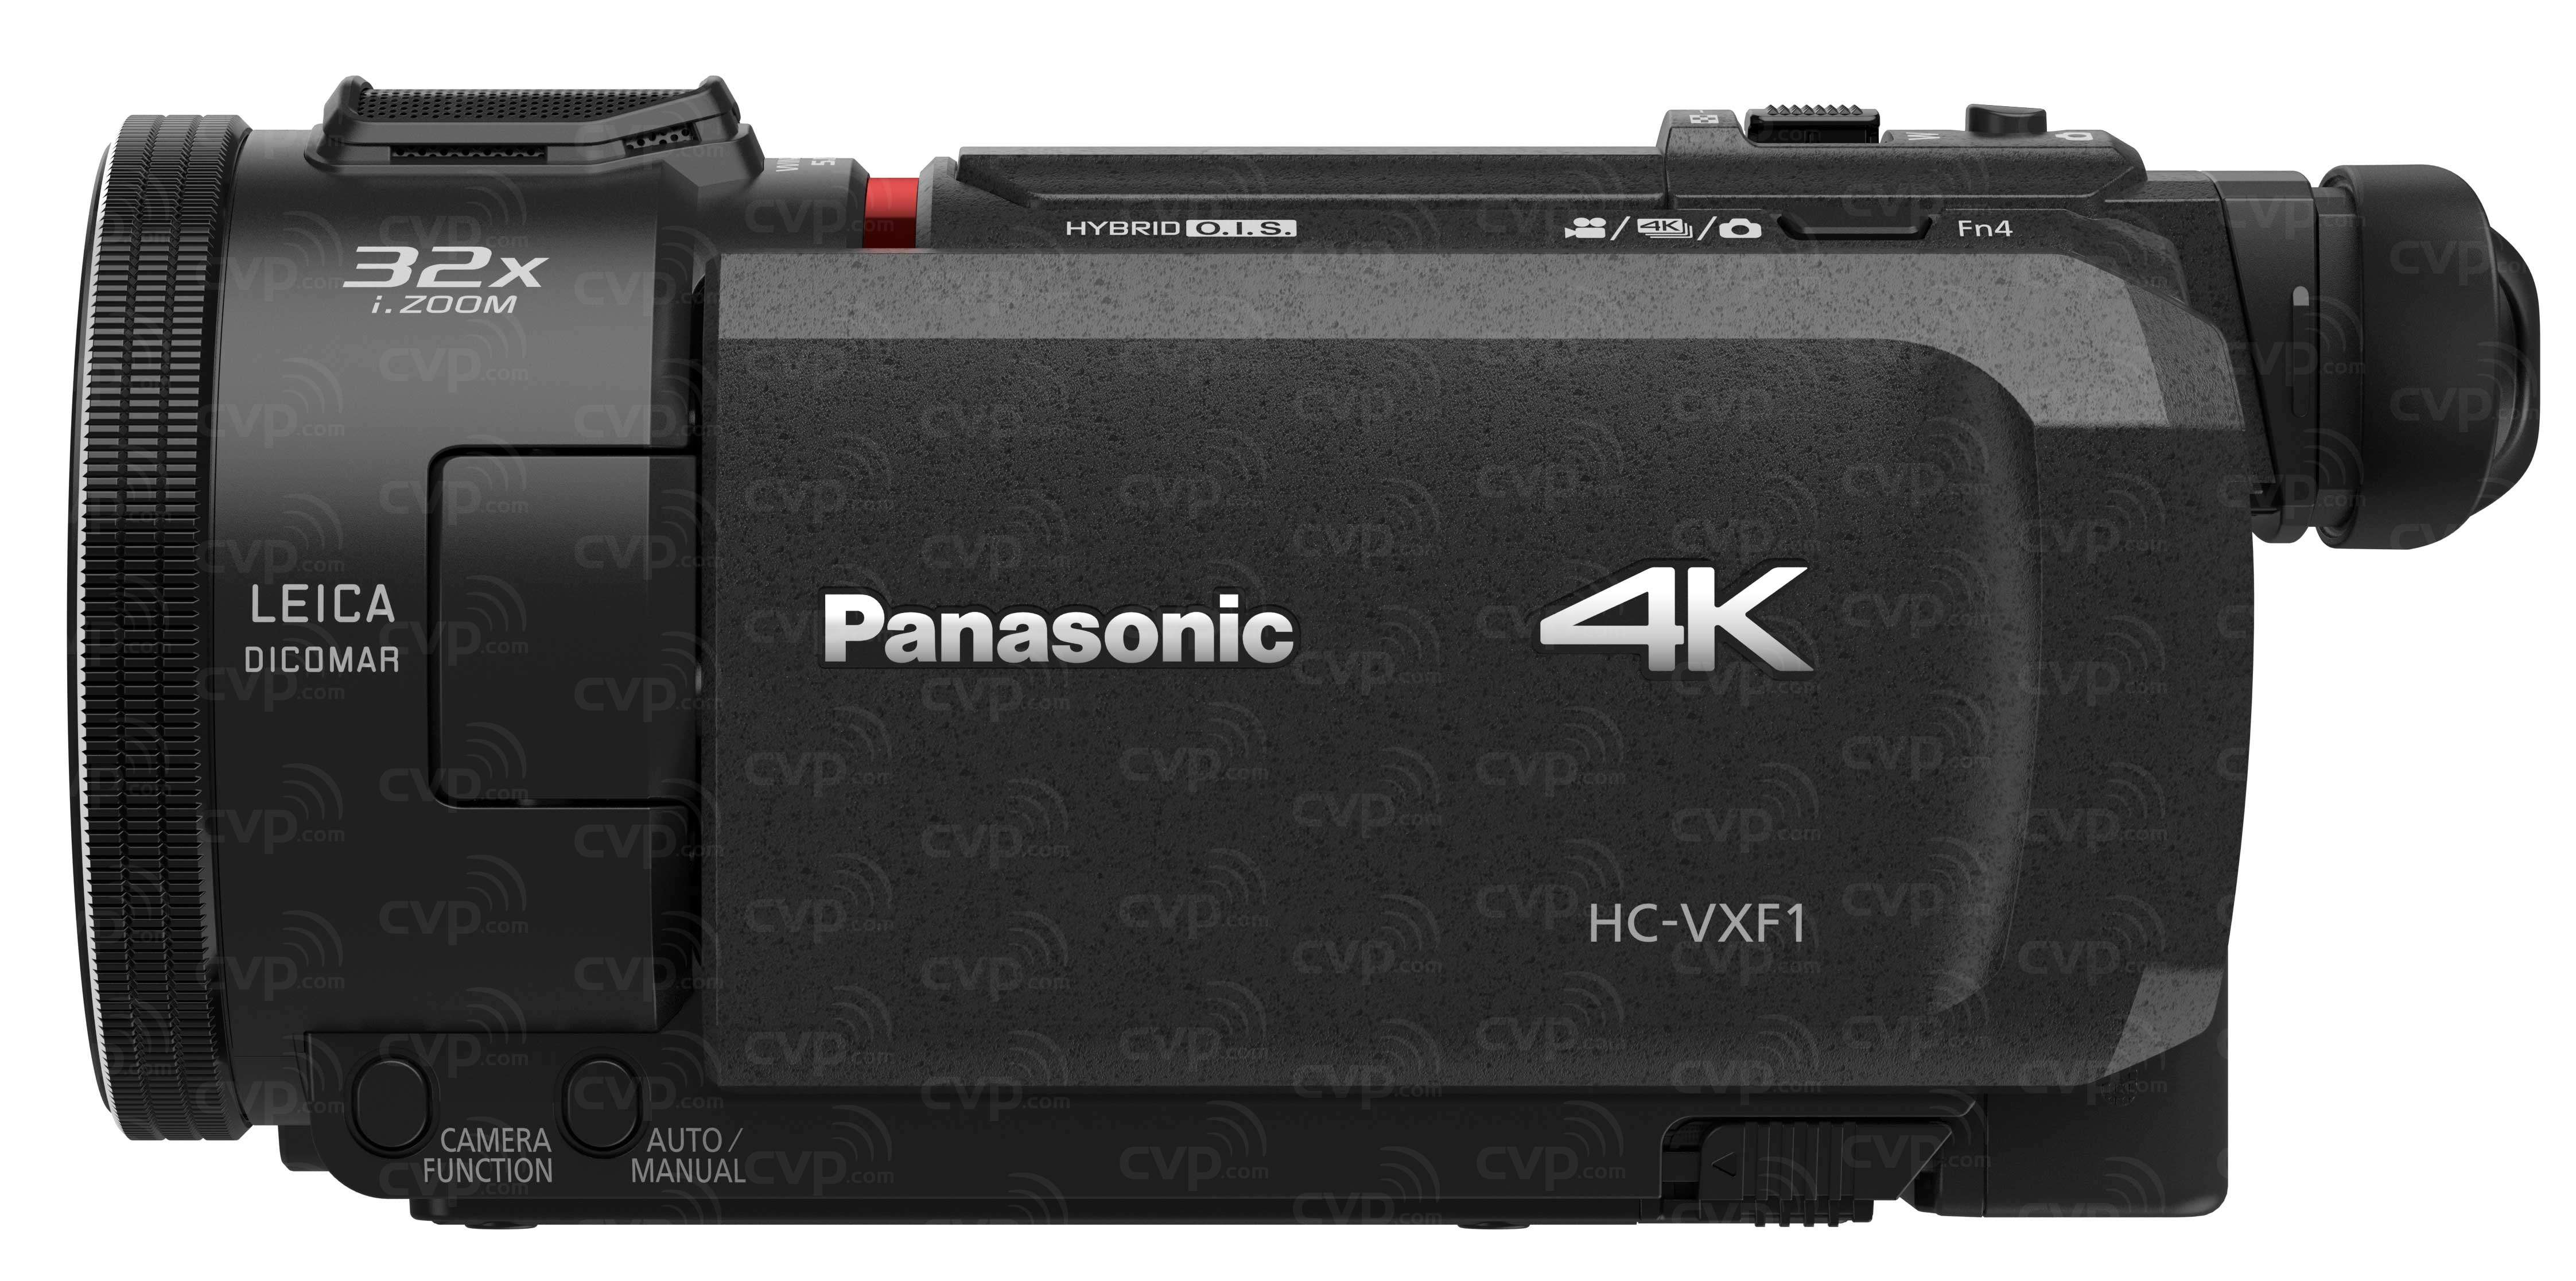 Panasonic HC-VXF1 4K Camcorder